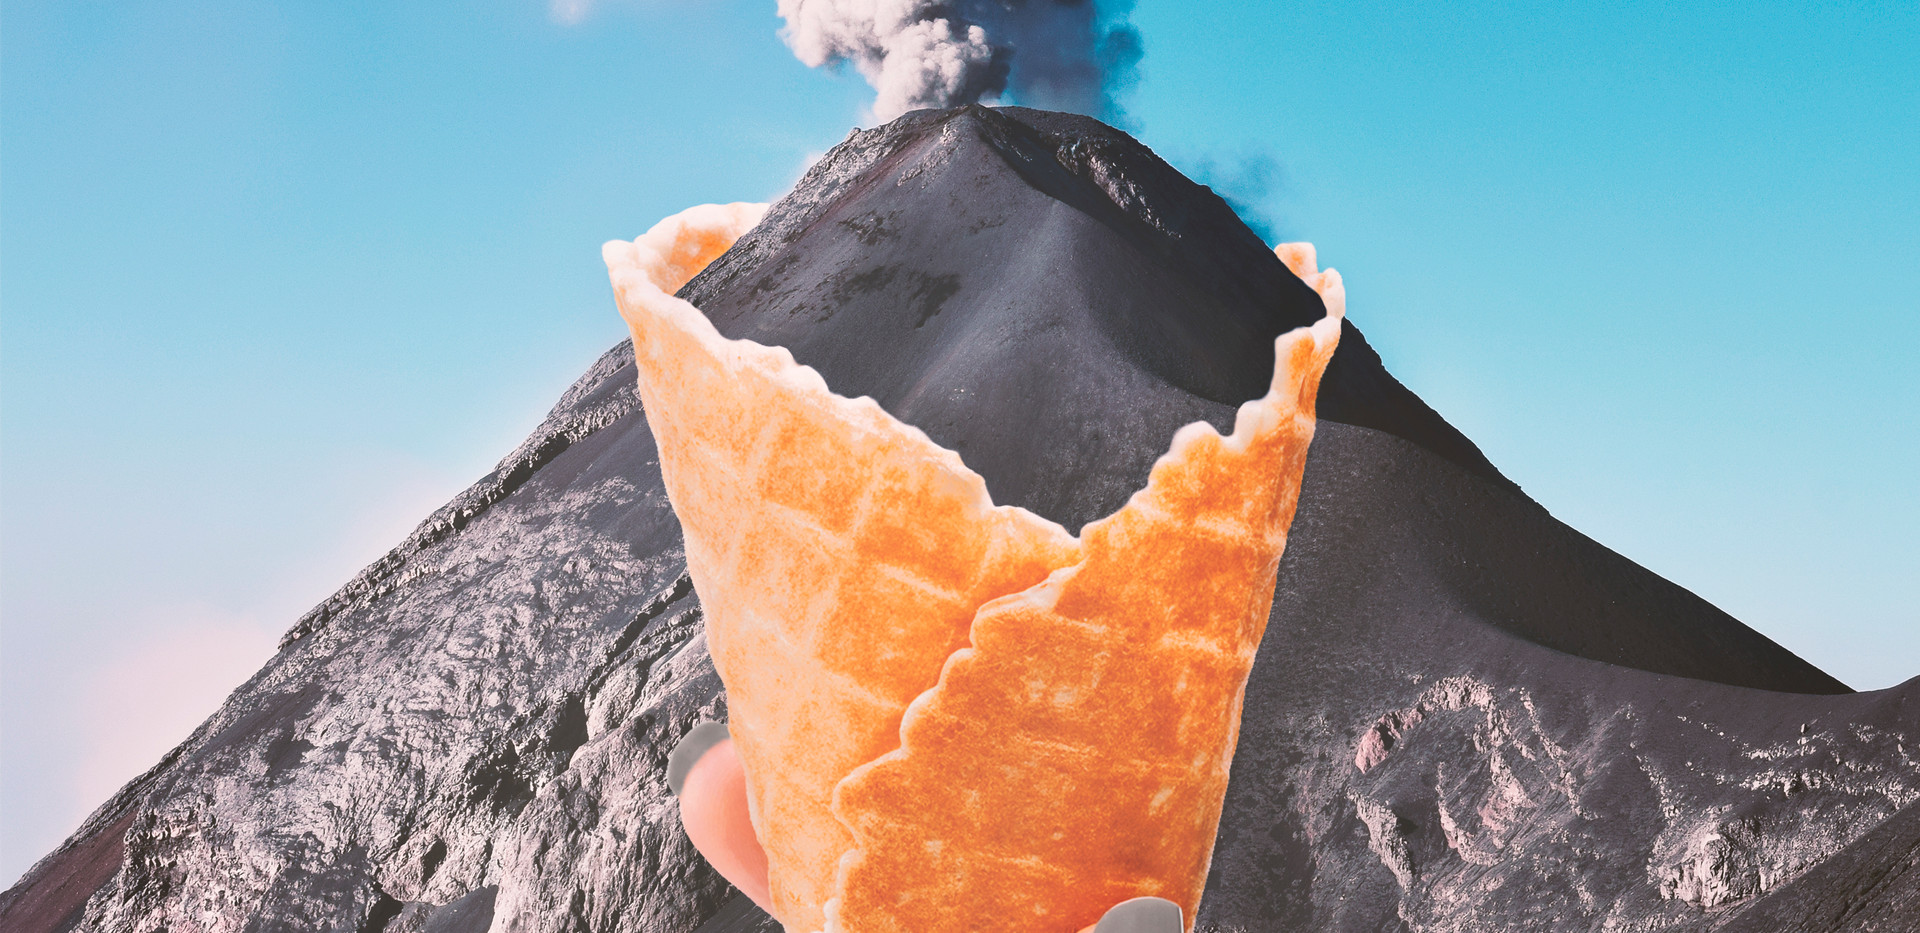 Volcano food.jpg